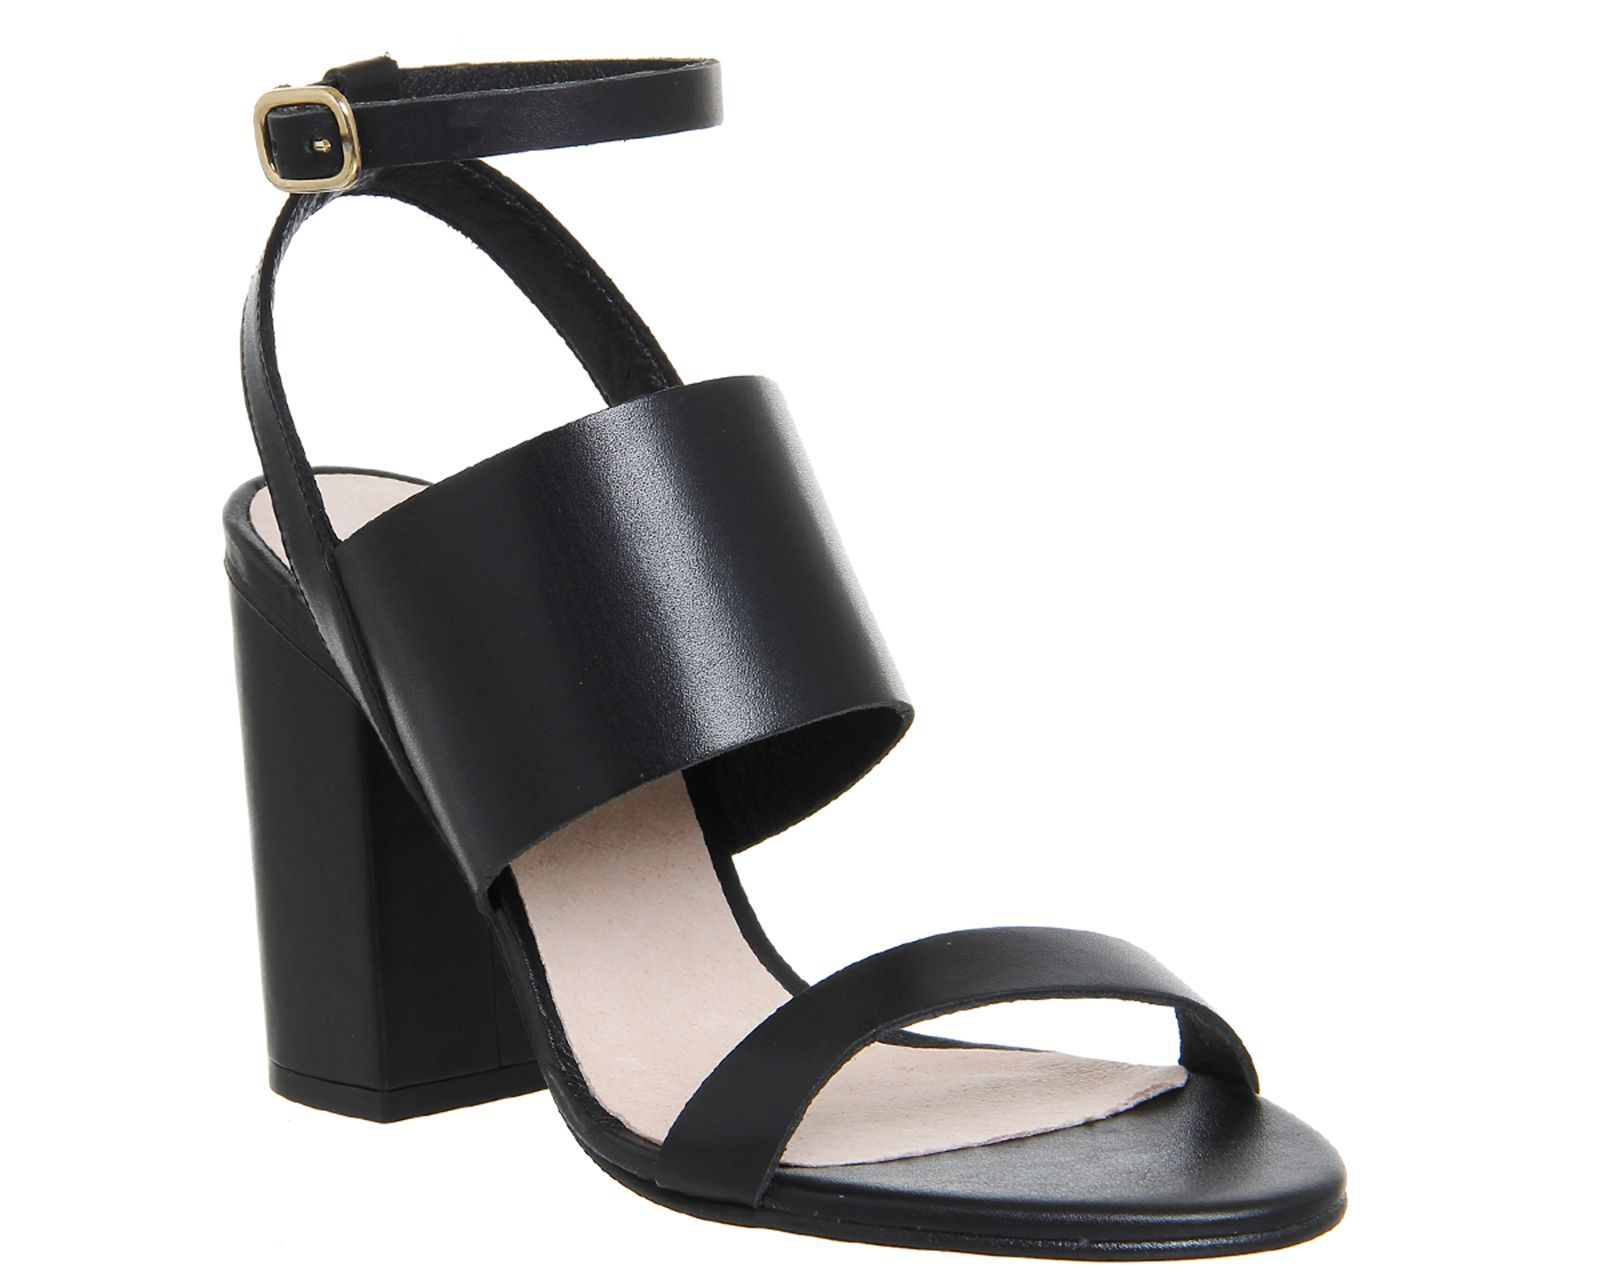 Office Time 3 strap block heel sandals Q8319